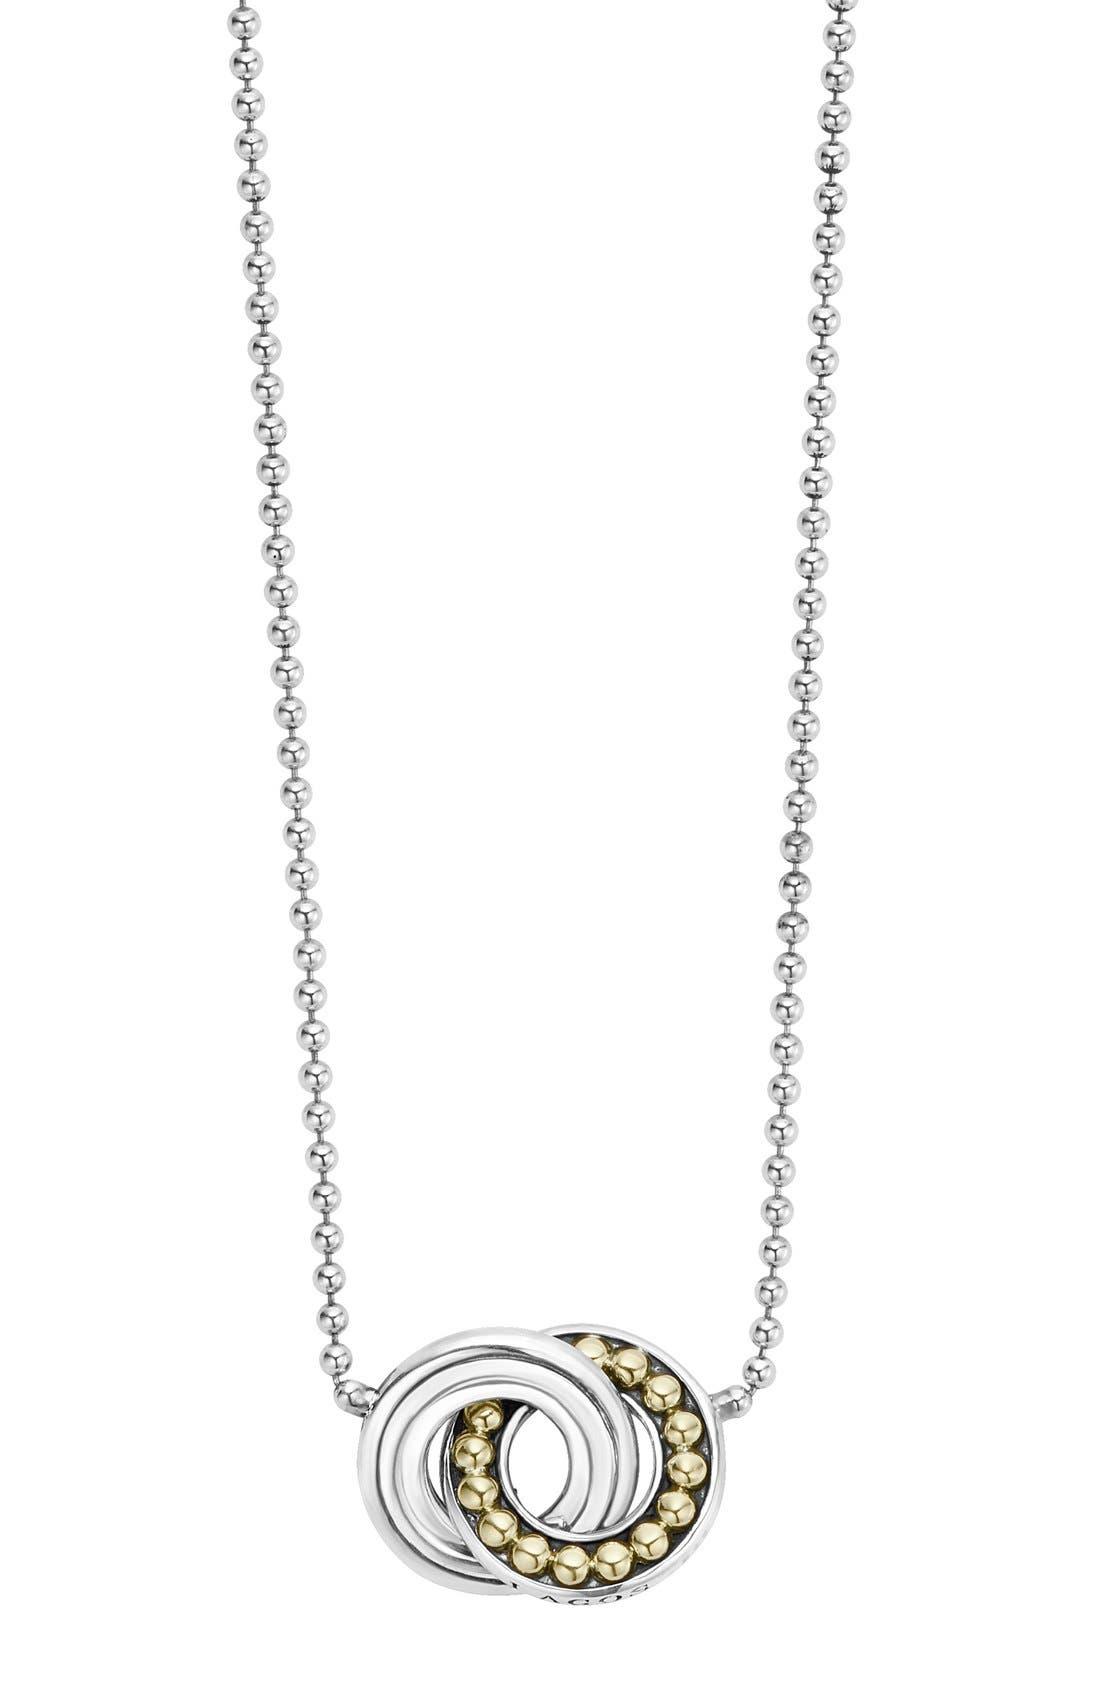 Main Image - LAGOS Enso Pendant Necklace